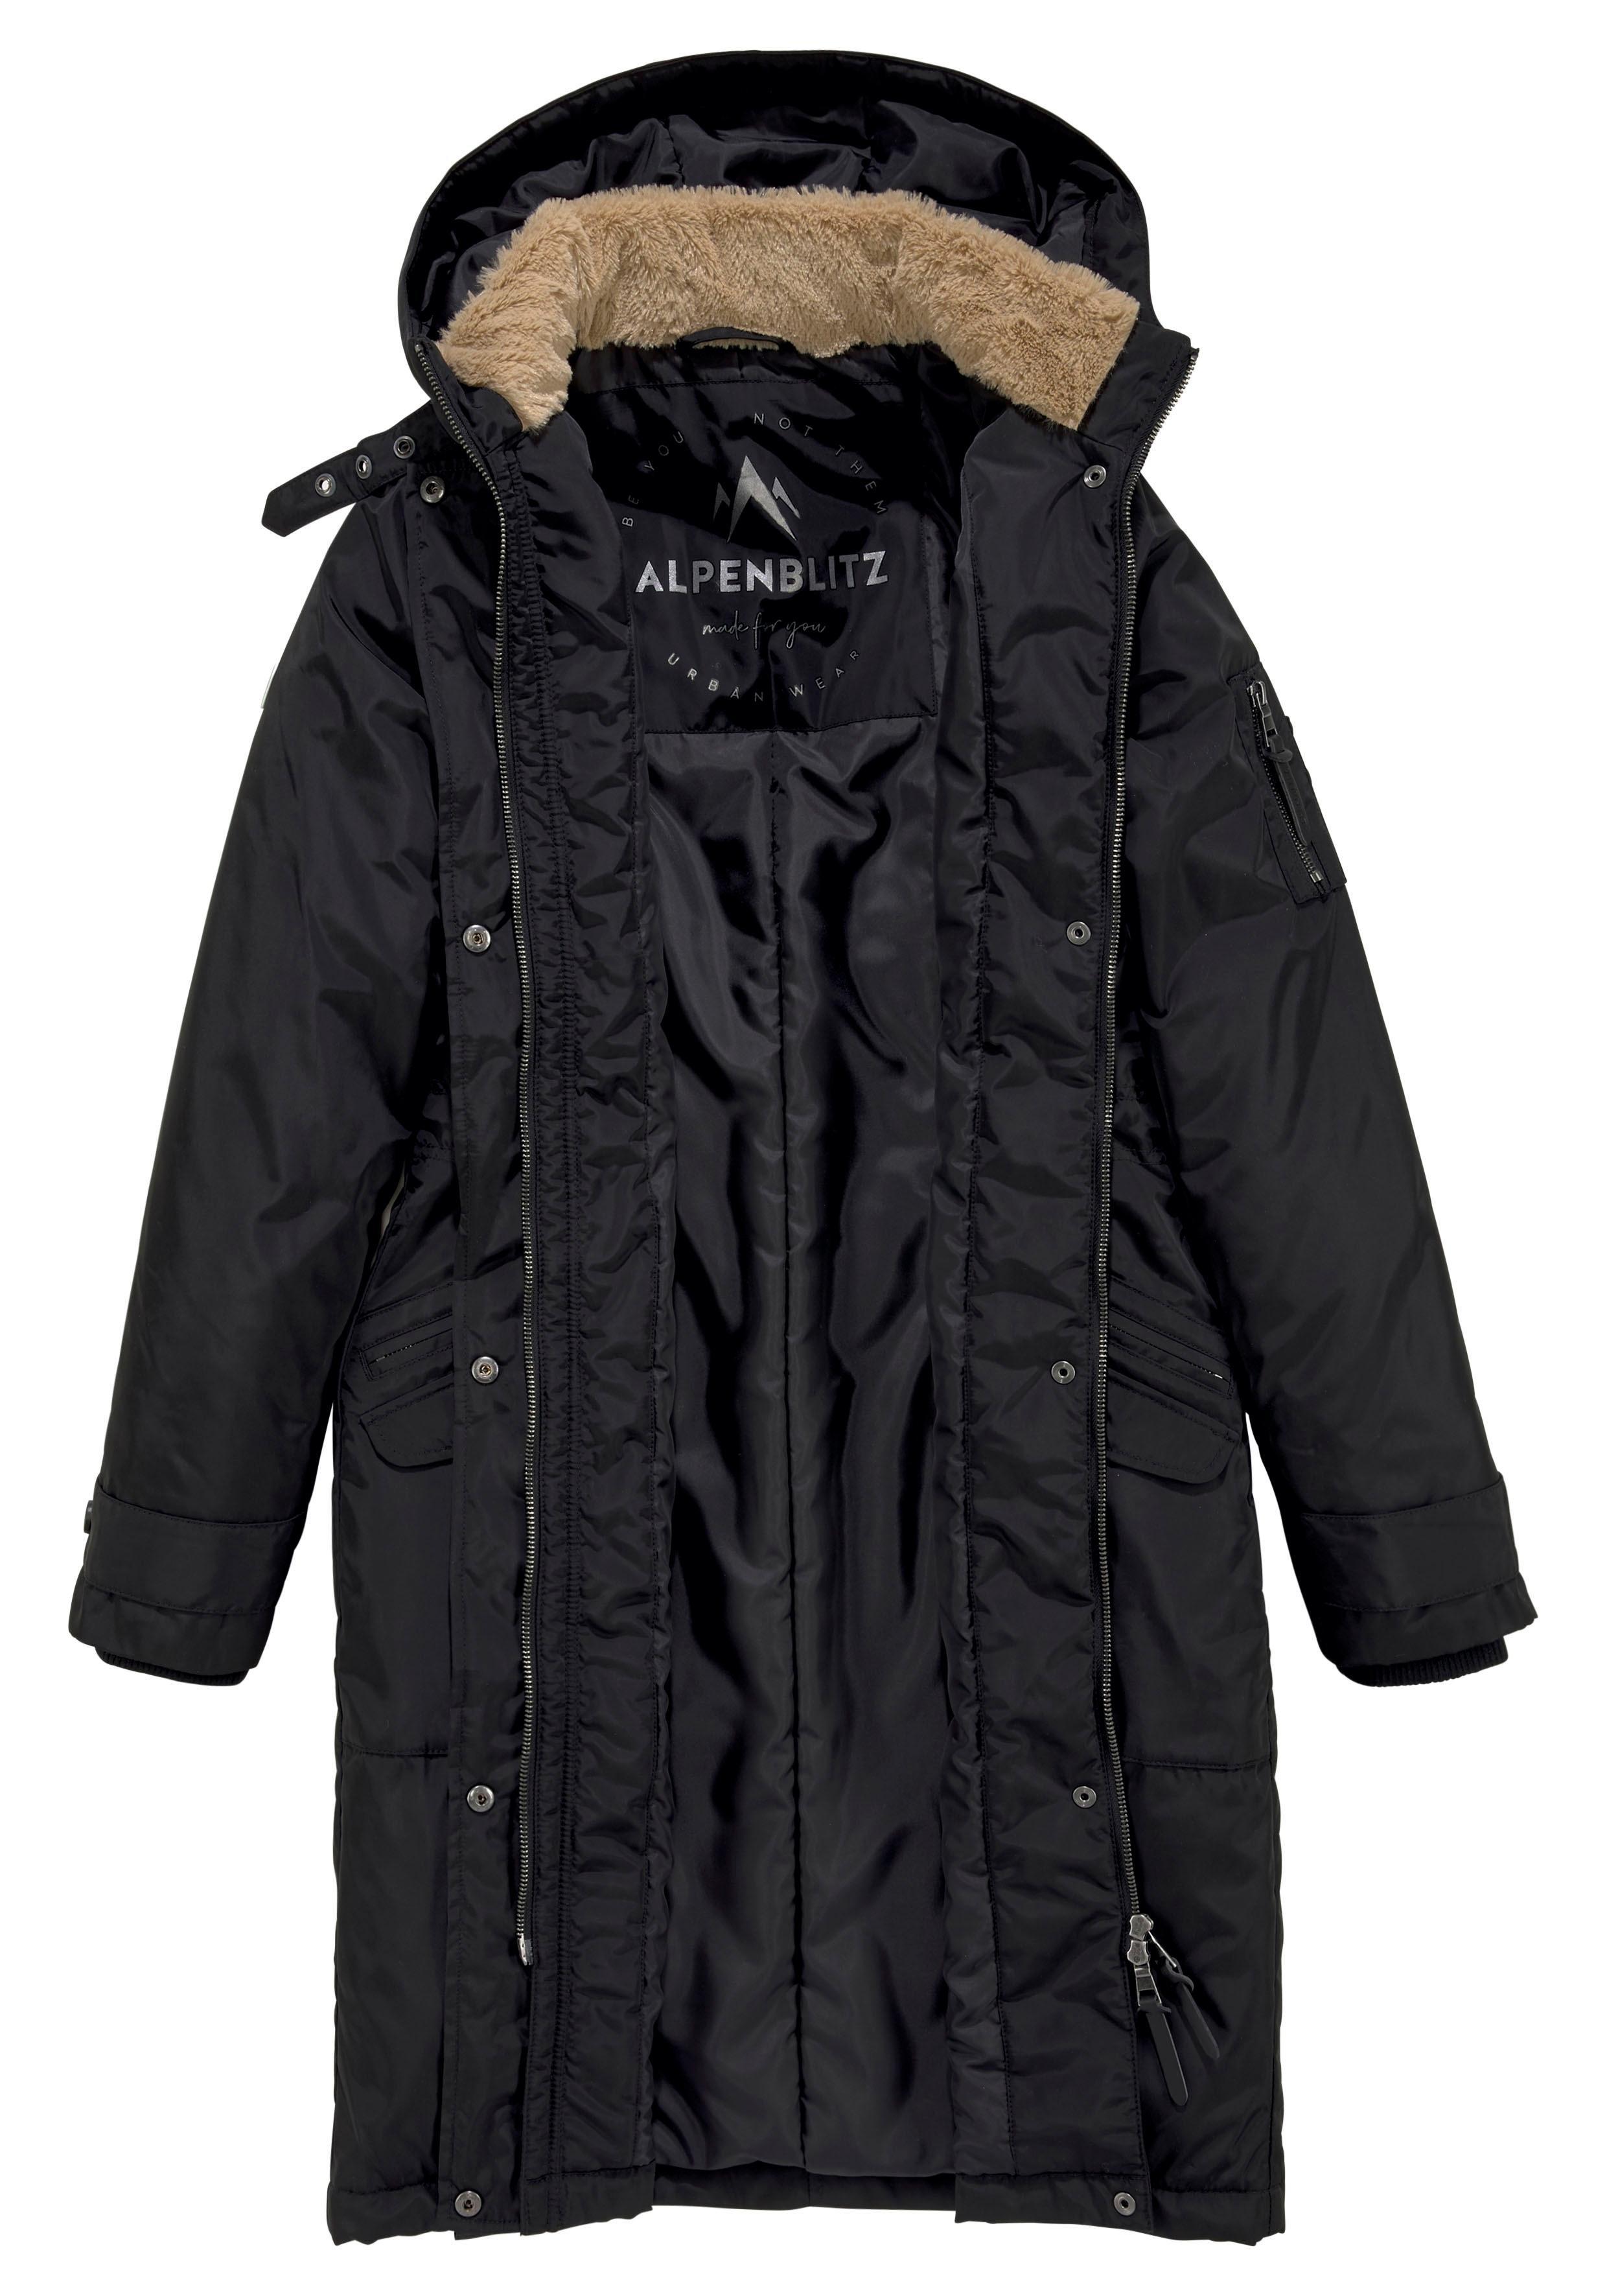 ALPENBLITZ winterjas »Parka« bij OTTO online kopen